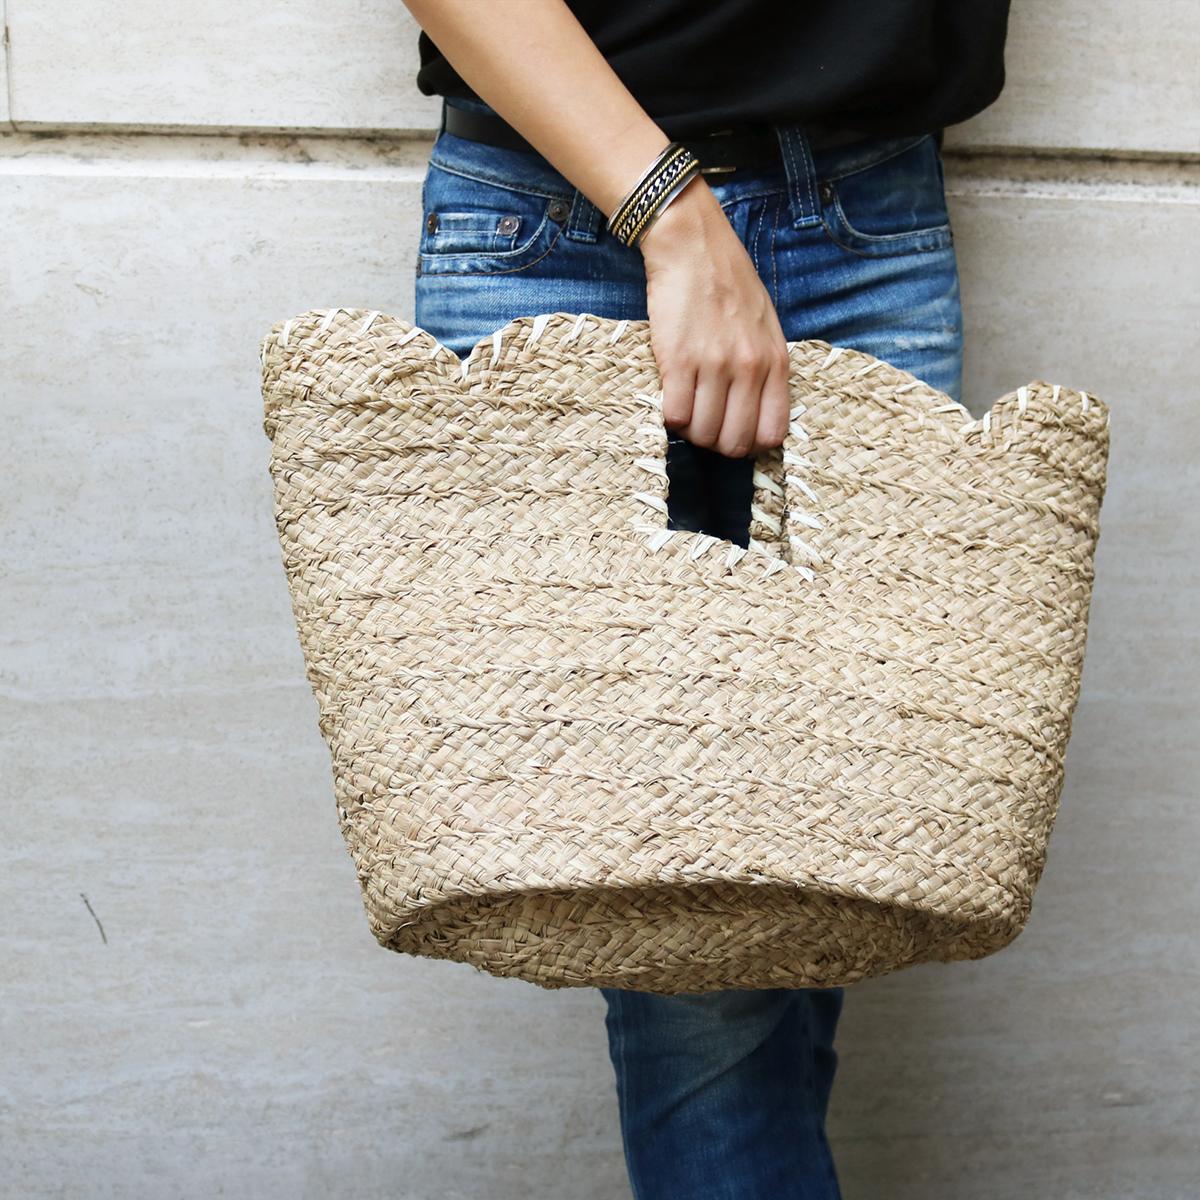 Stitch Raffia Bag